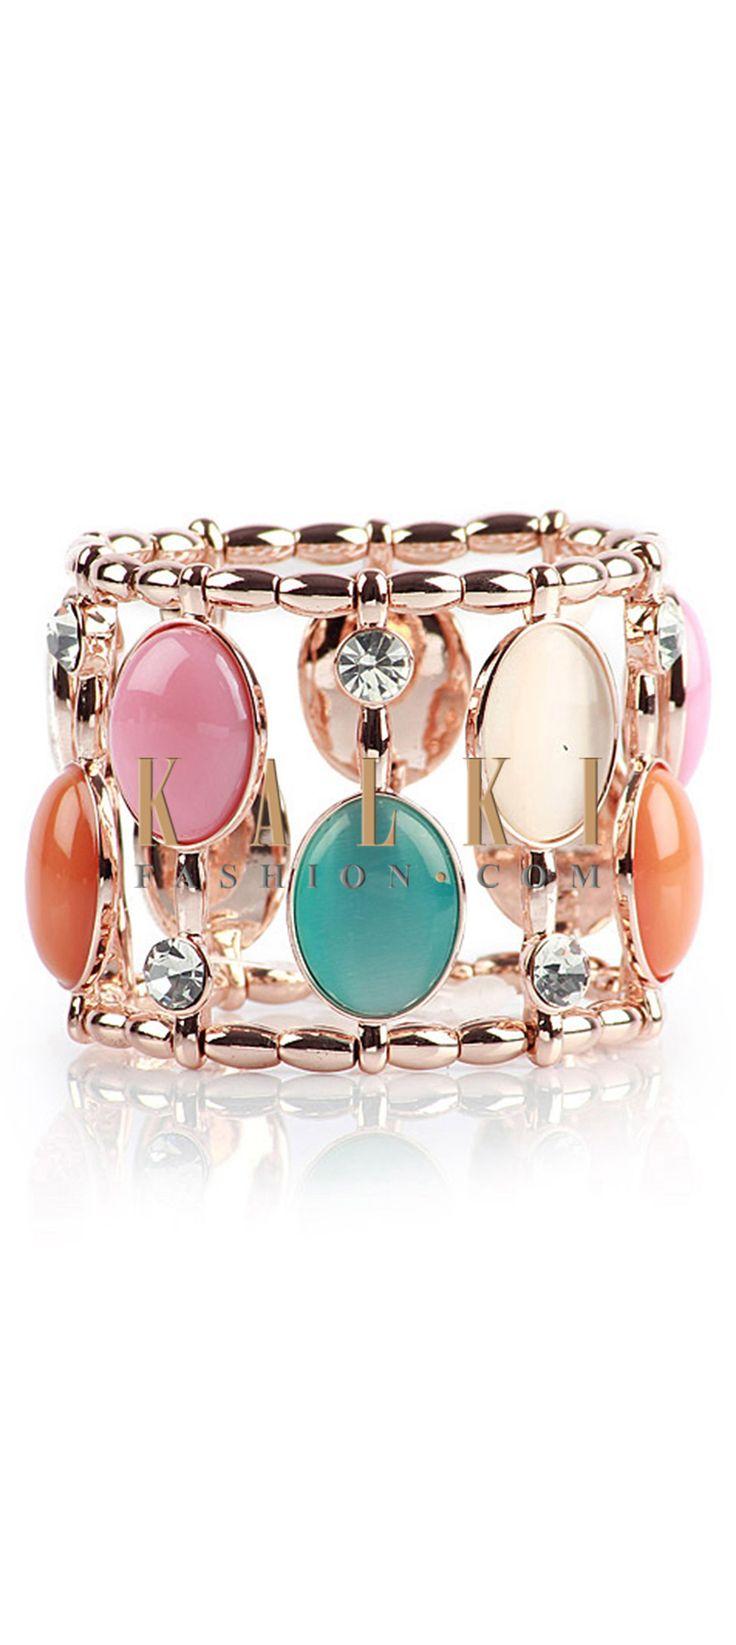 Buy Online from the link below http://www.kalkifashion.com/multi-coloured-high-shine-bracelet.html